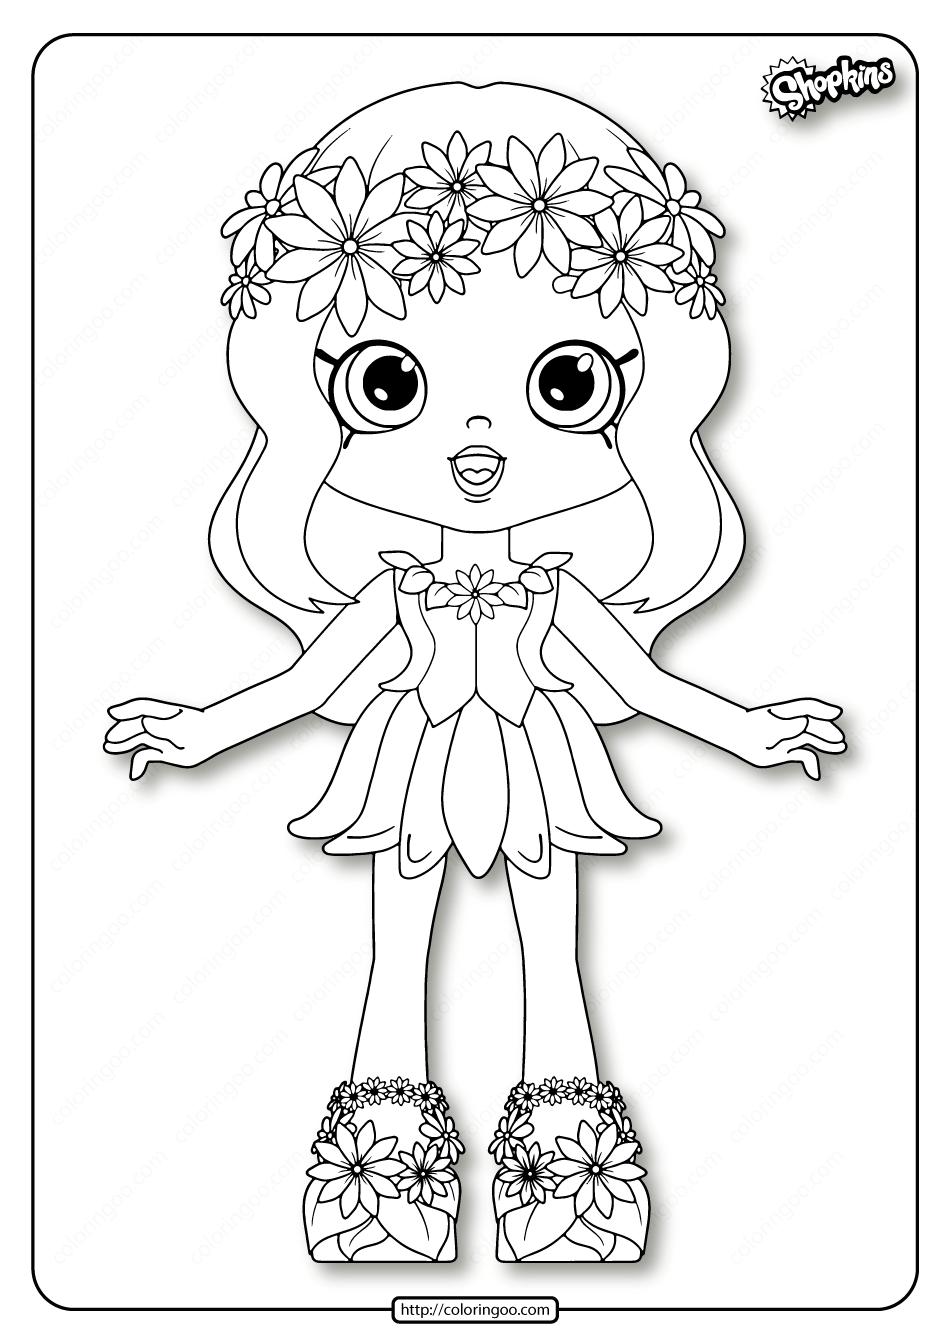 Printable Shopkins Daisy Petals Coloring Pages